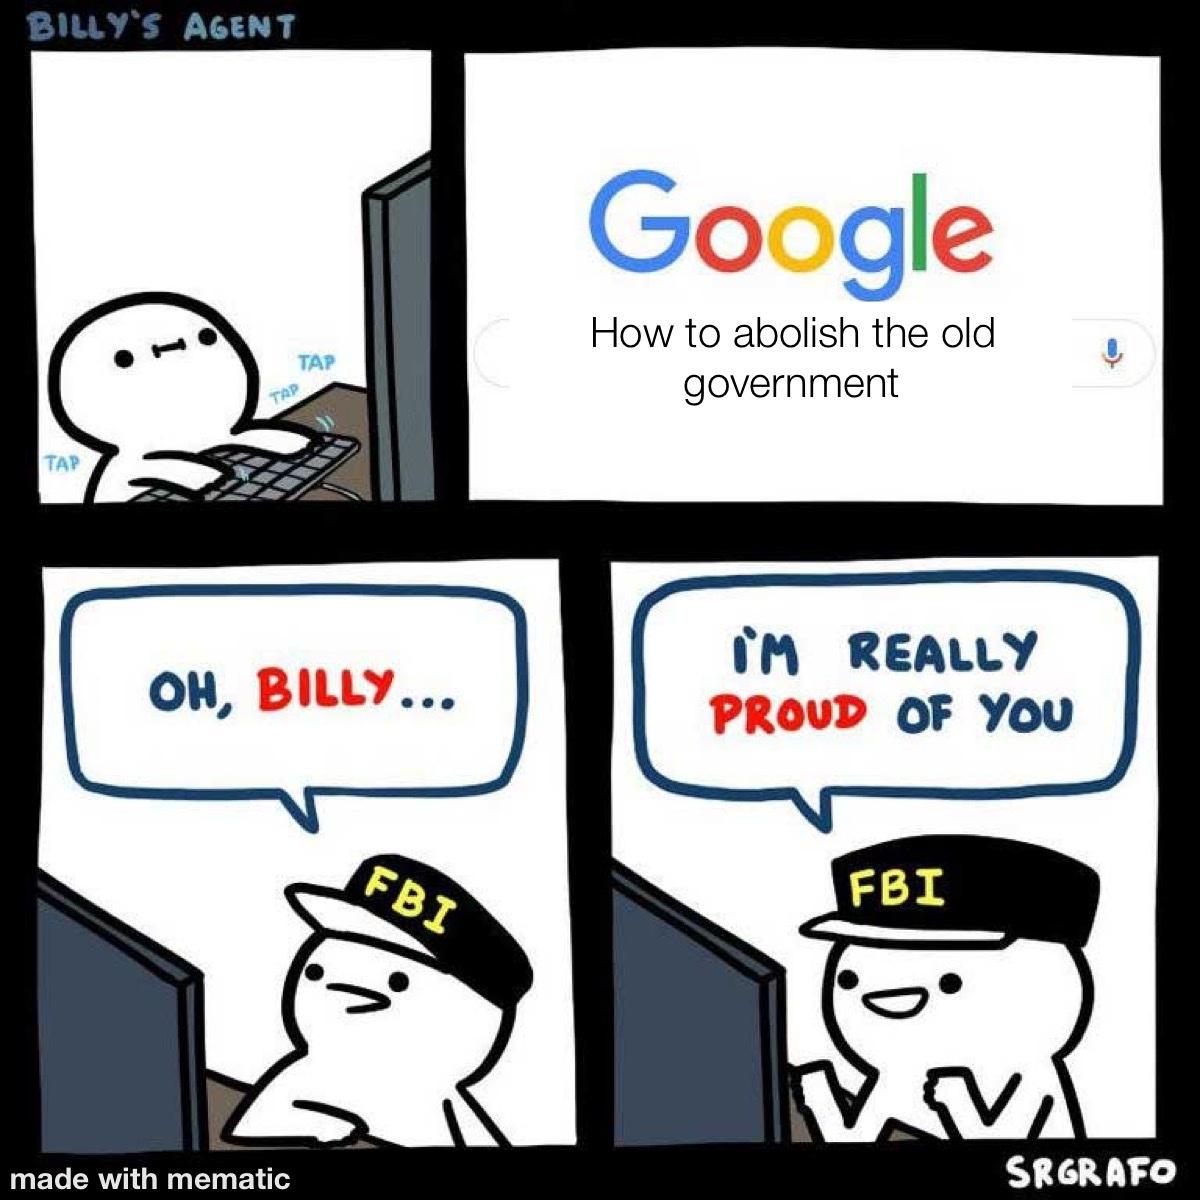 oh billy - meme